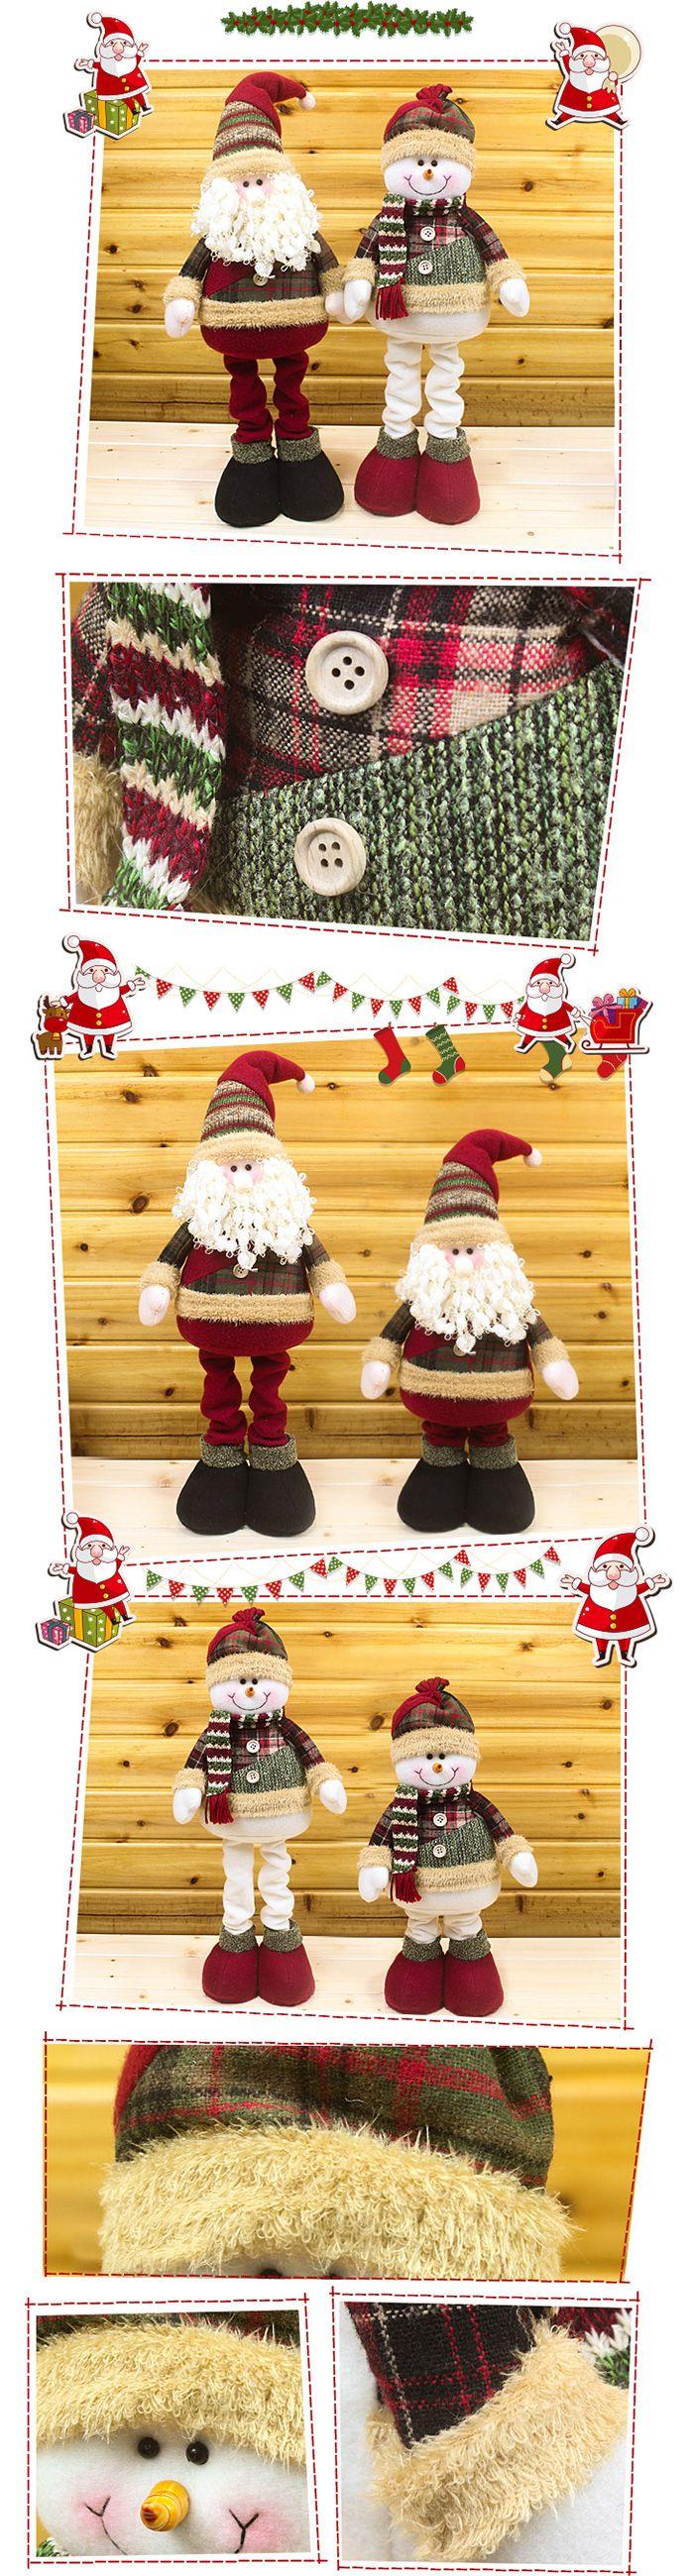 Winter Dress-up Snowman Santa Claus Stretchable Cloth Doll